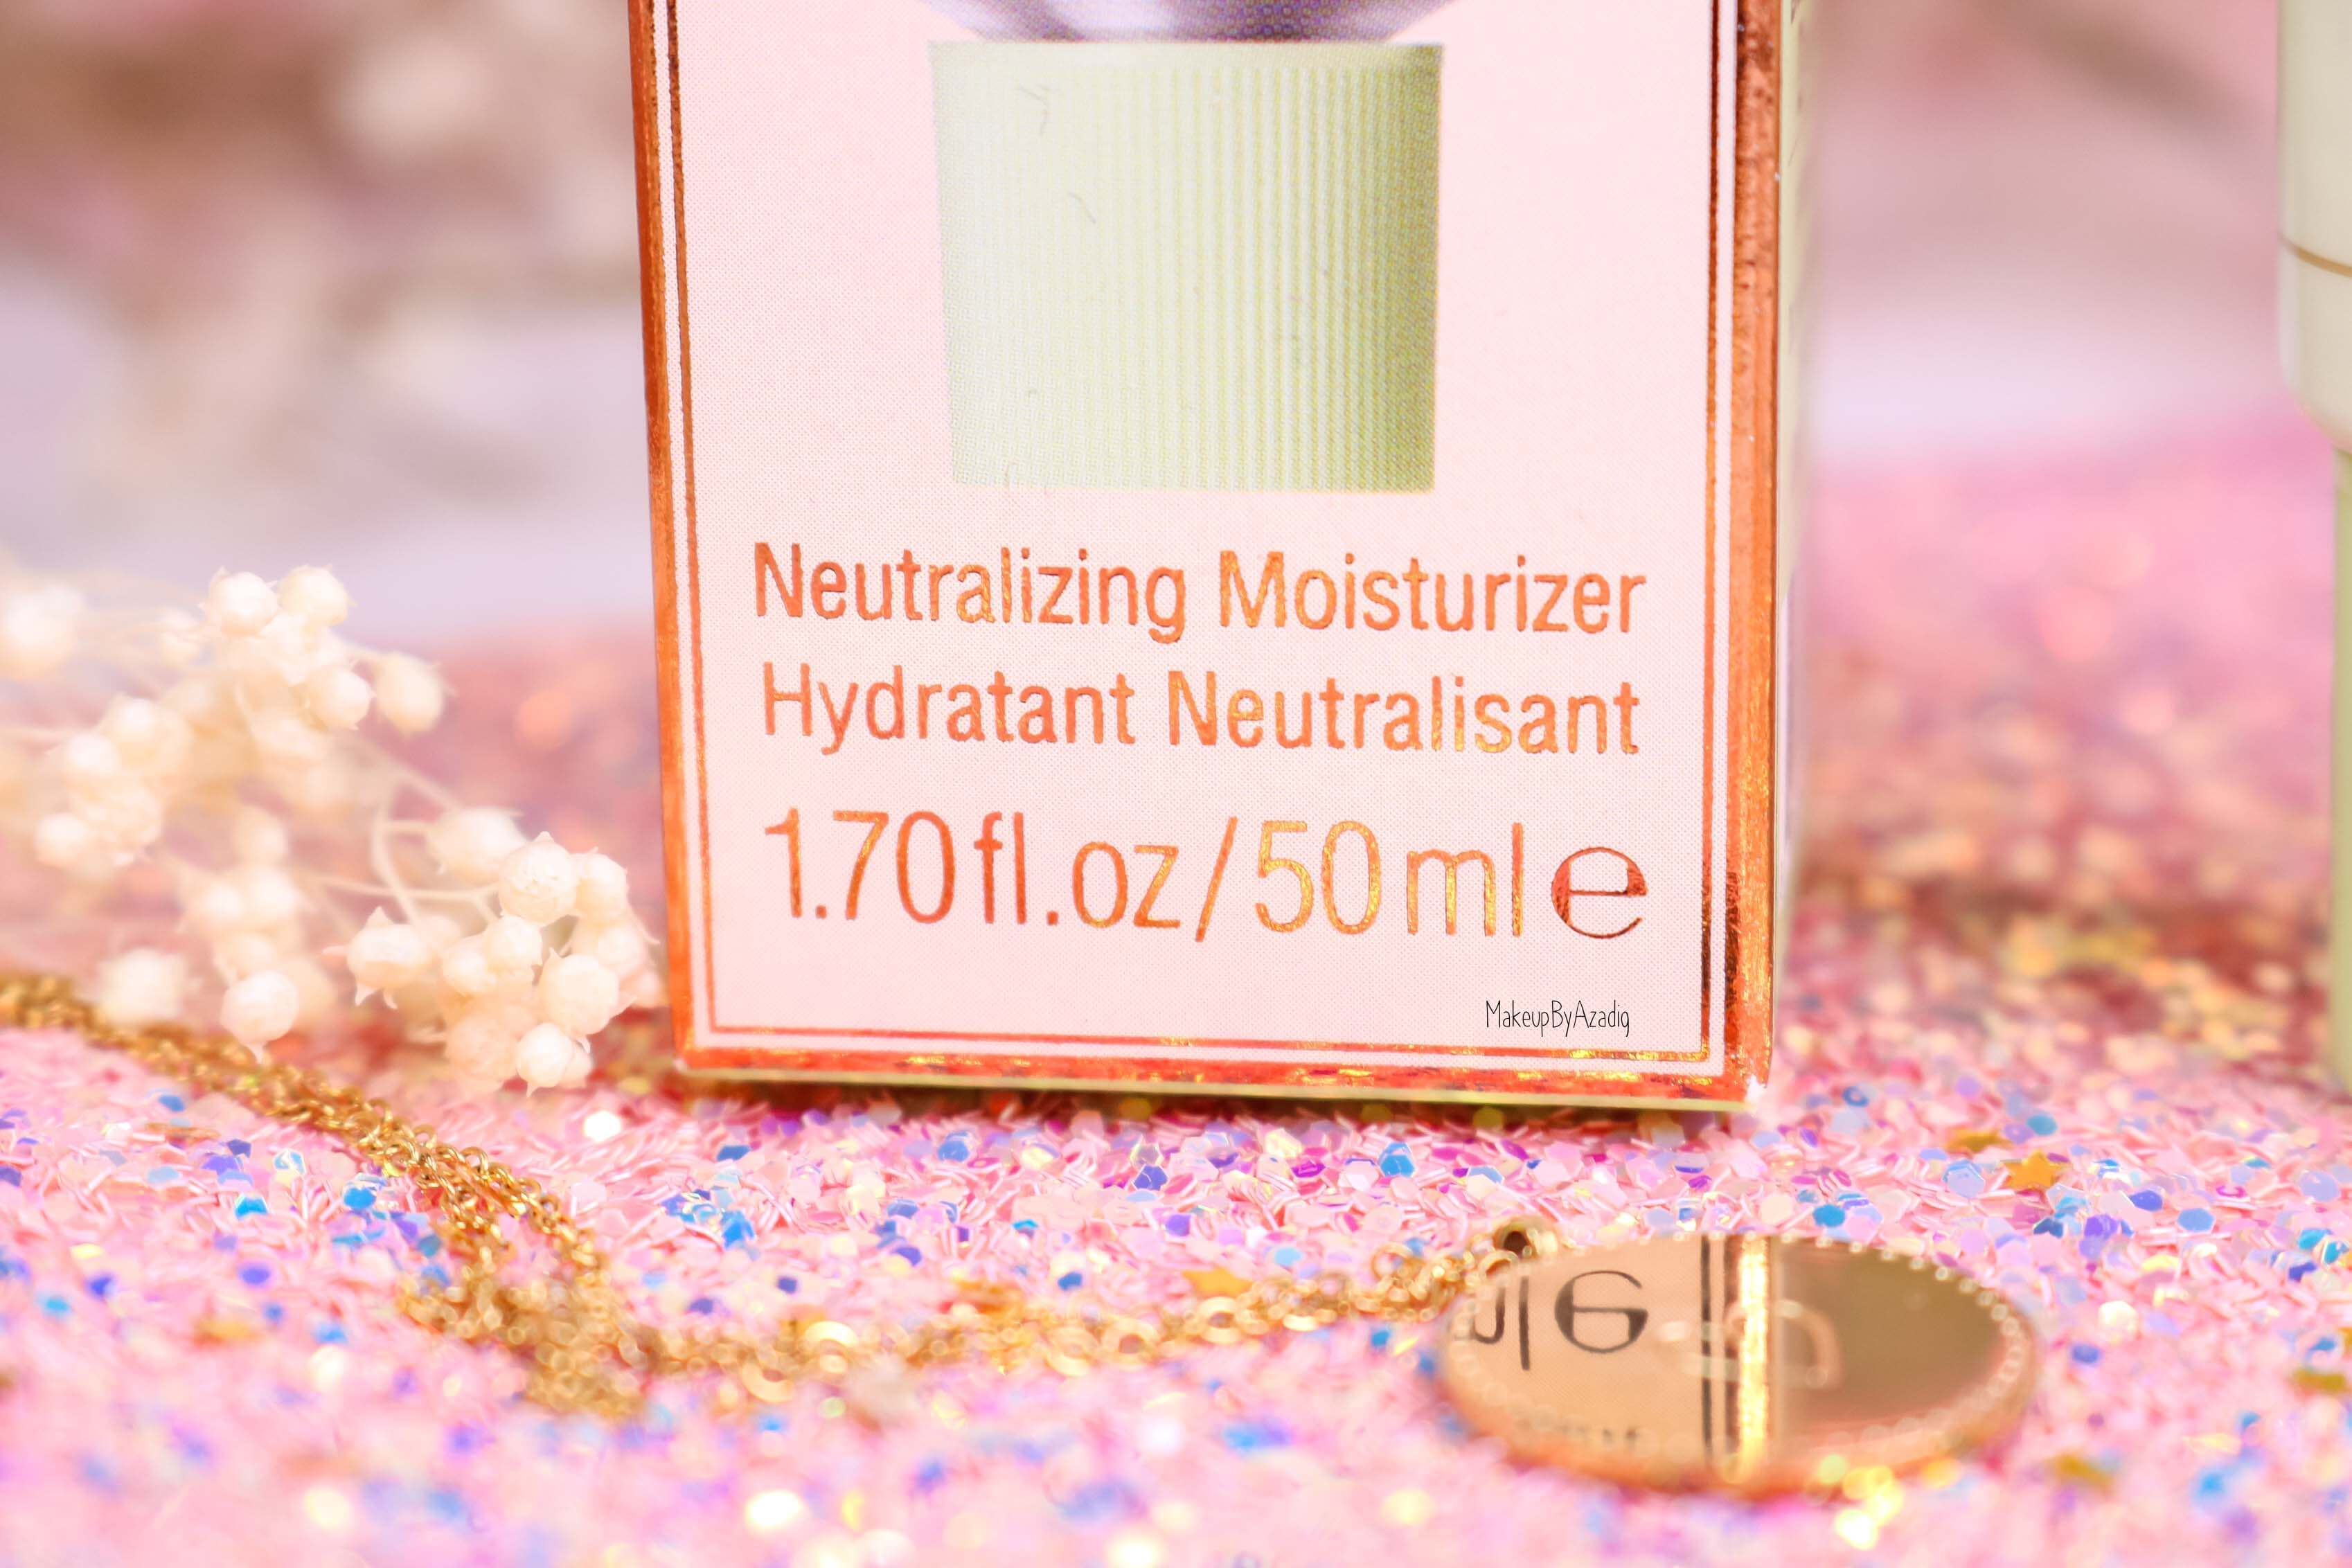 revue-routine-soin-skincare-pixi-beauty-visage-glow-tonic-serum-phenomenal-gel-aloe-vera-makeupbyazadig-sephora-avis-prix-hydratant